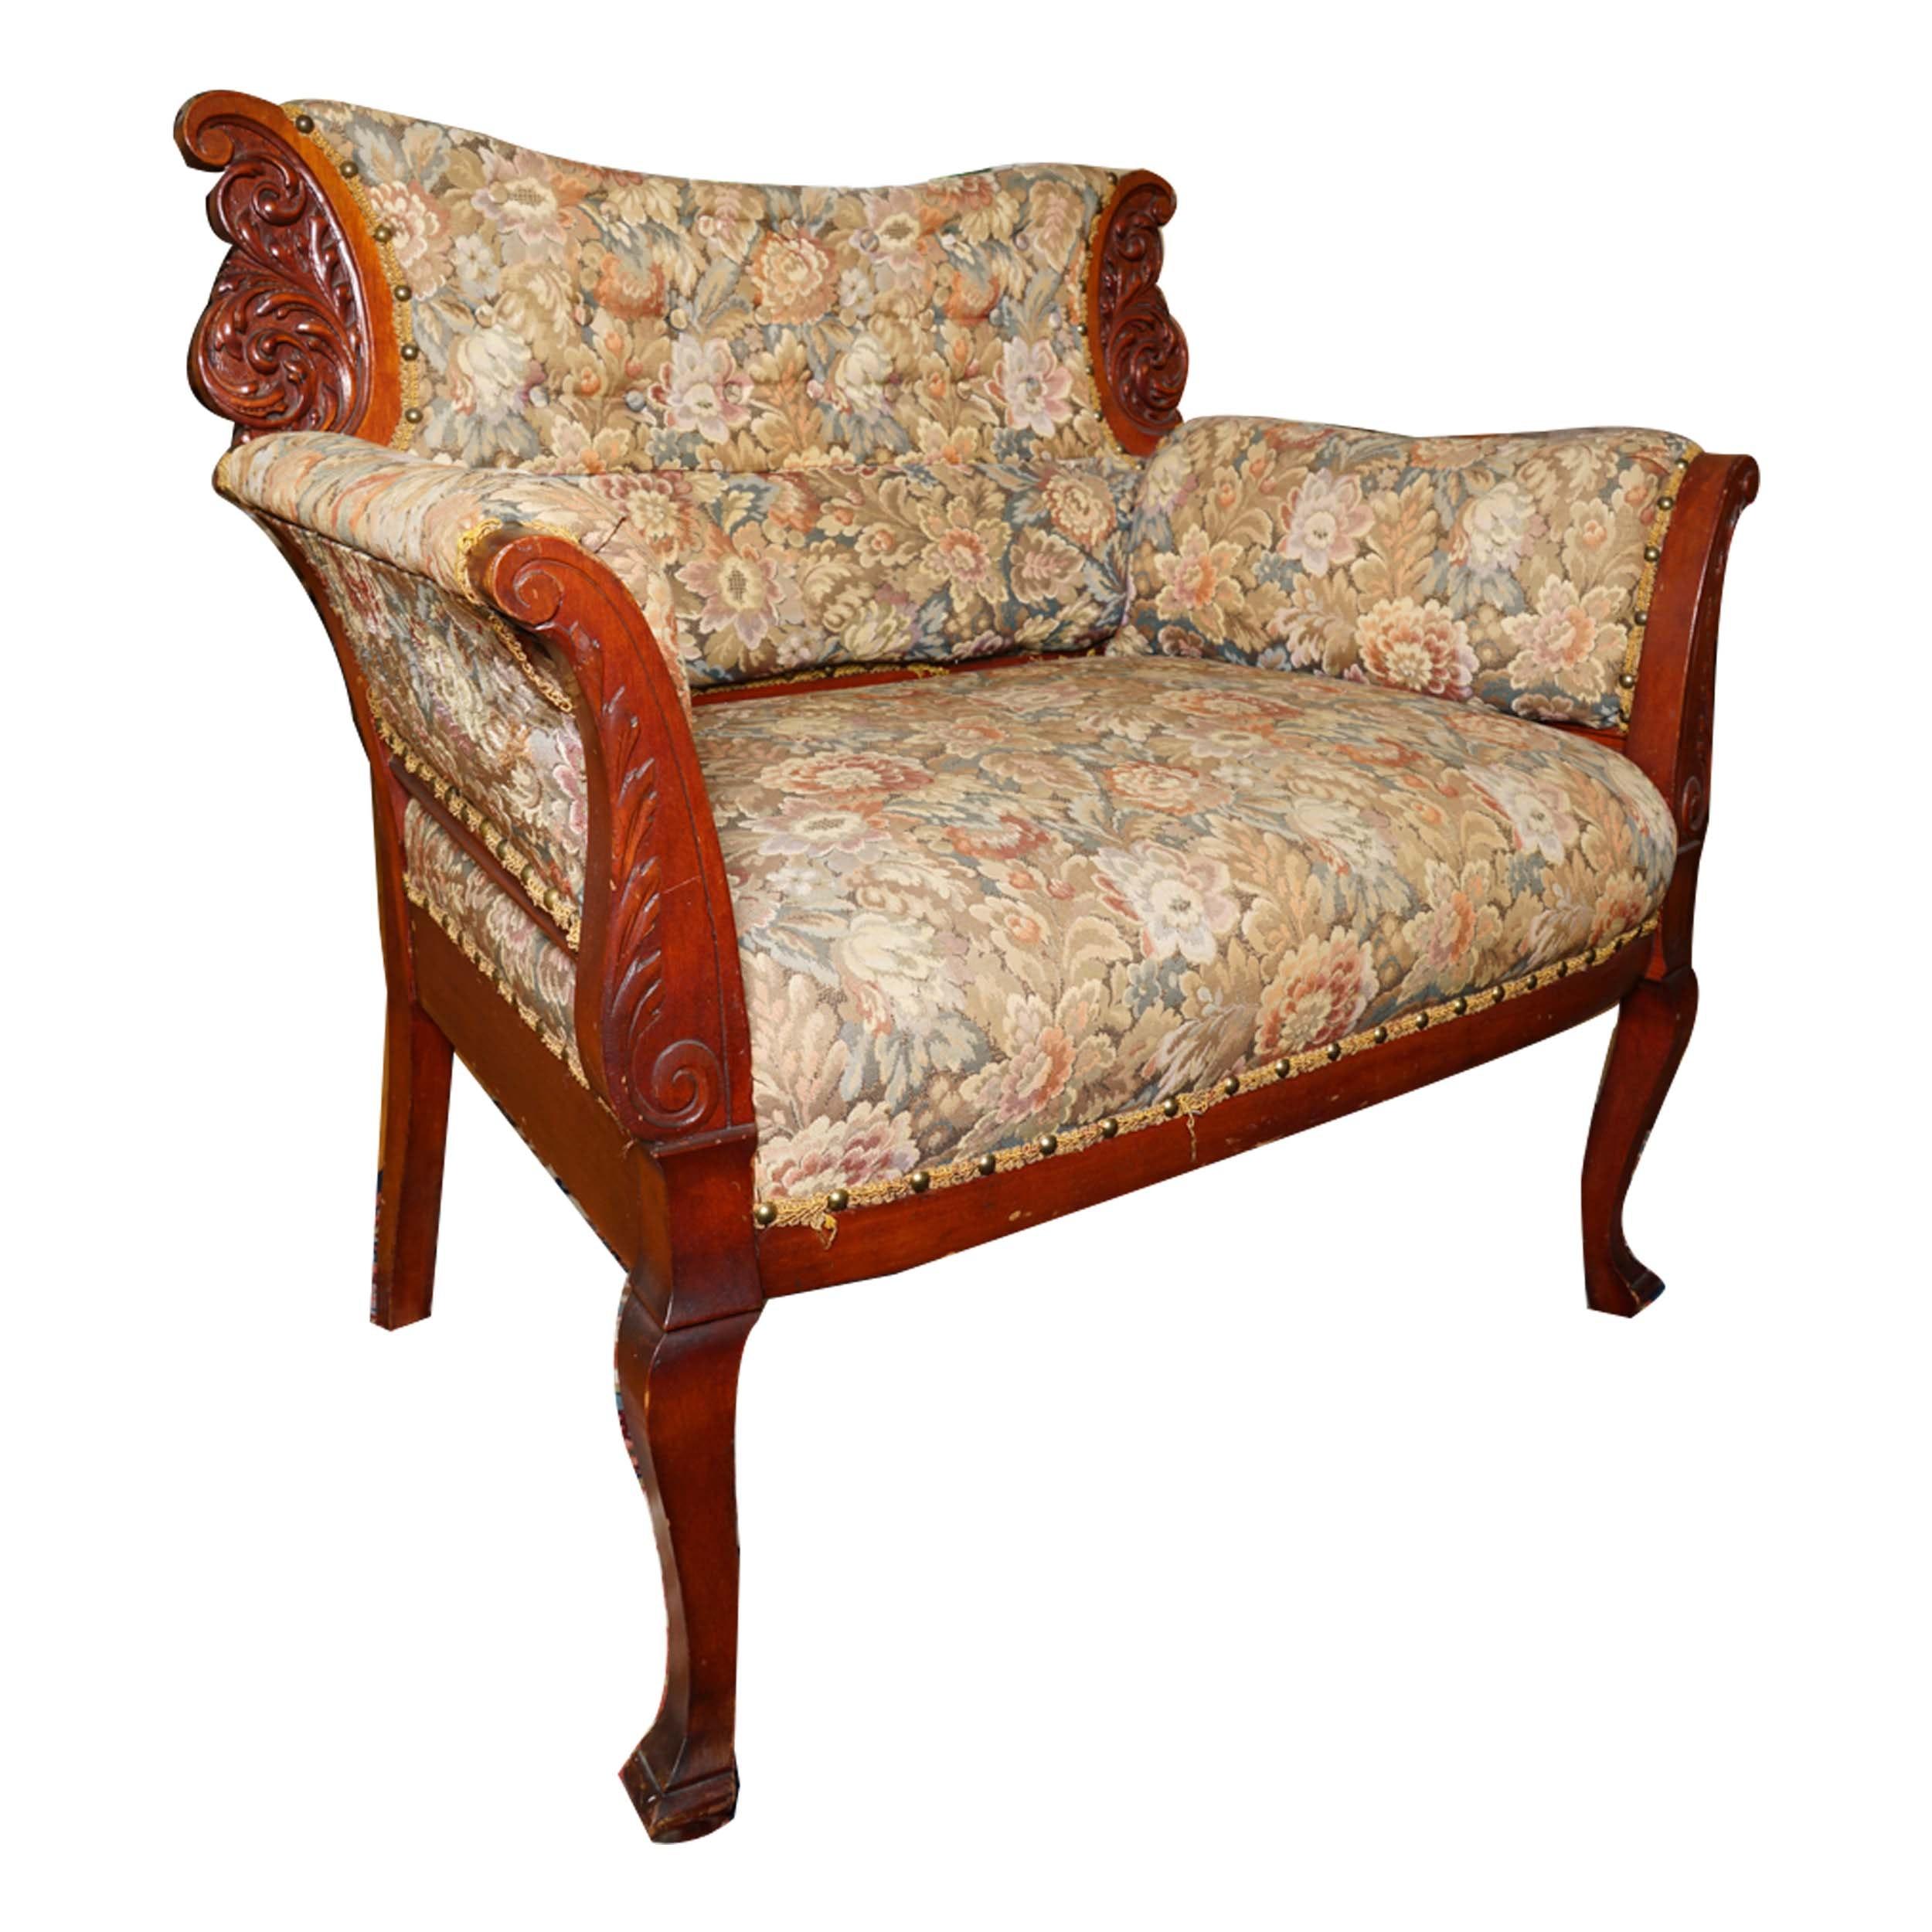 Vintage Georgian Revival Style Carved Arm Chair